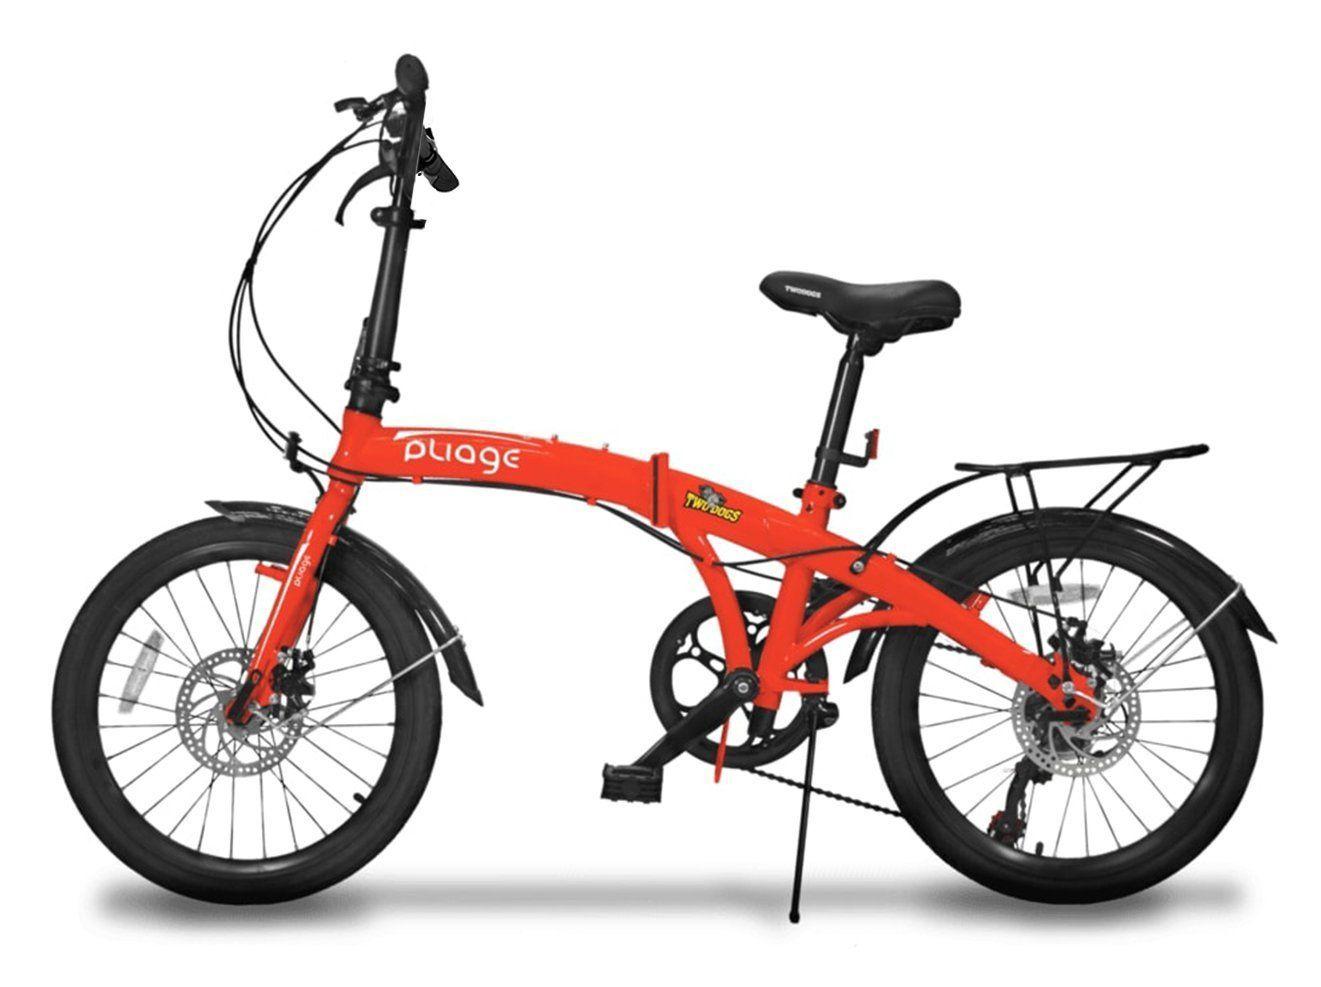 Bicicleta Dobrável Pliage Plus Vermelha Two Dogs